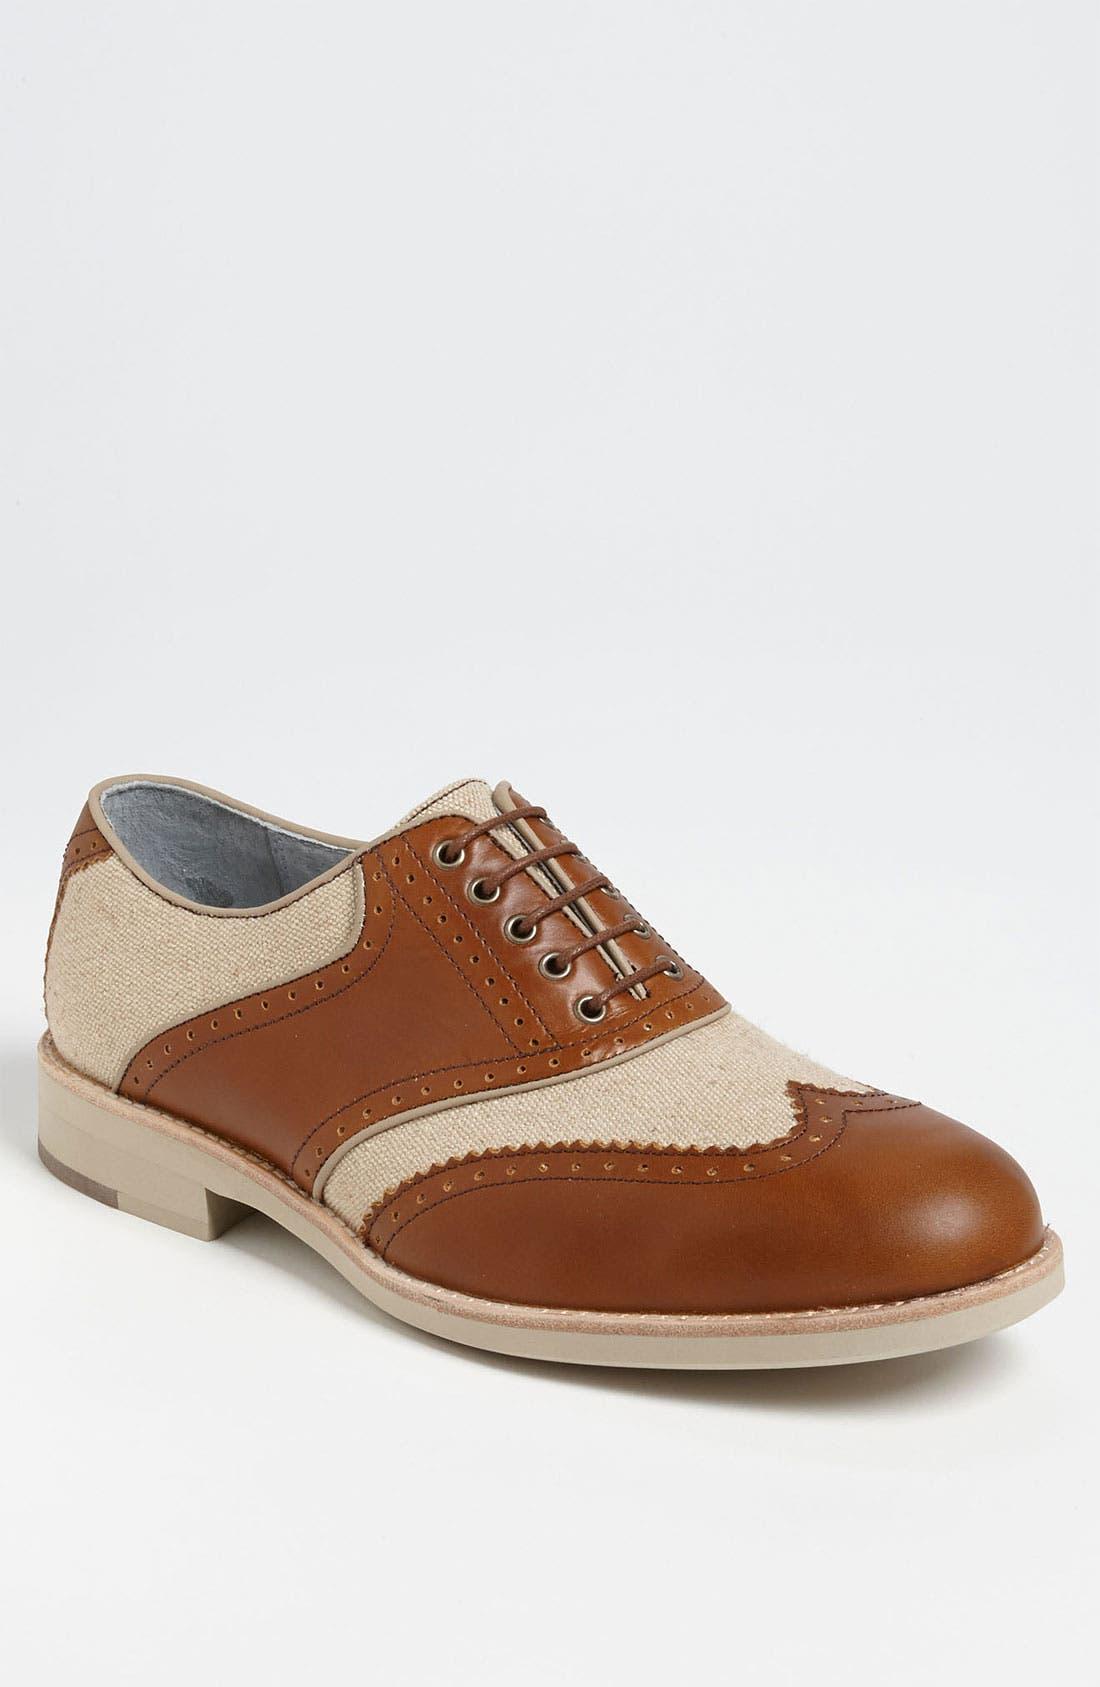 Main Image - Johnston & Murphy 'Ellington' Spectator Shoe